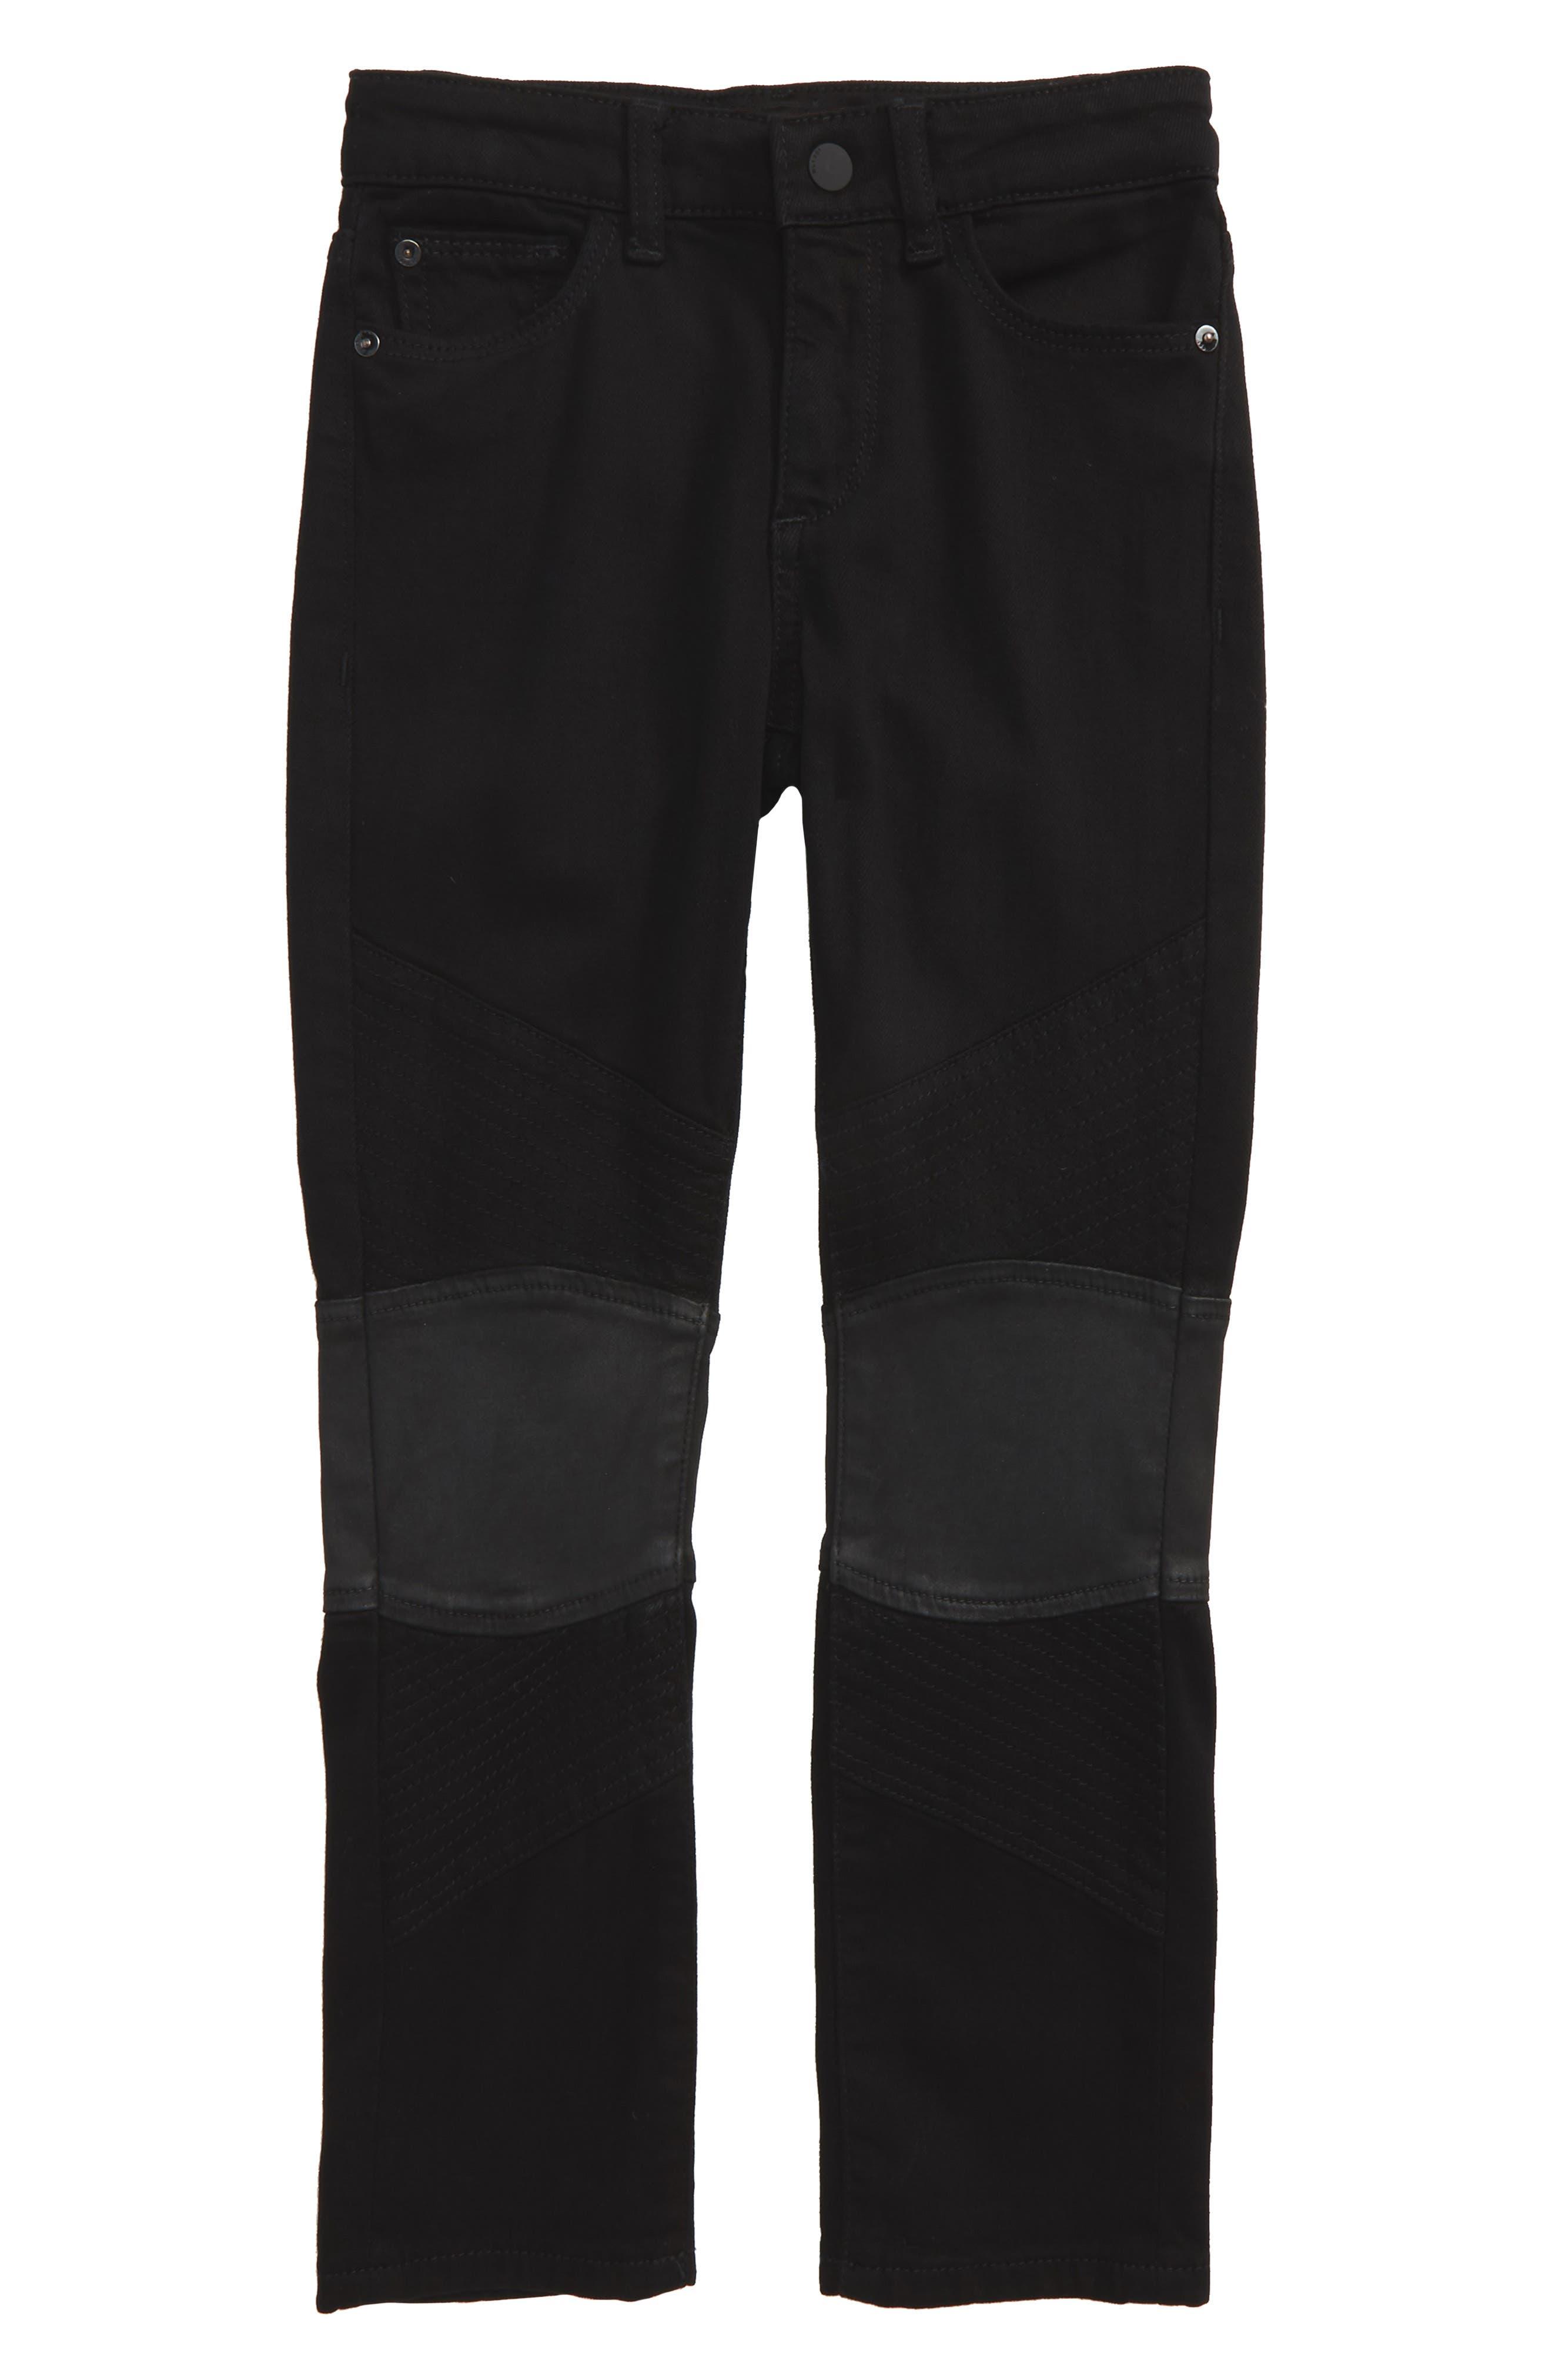 Hawke Skinny Moto Jeans,                         Main,                         color, Wheel